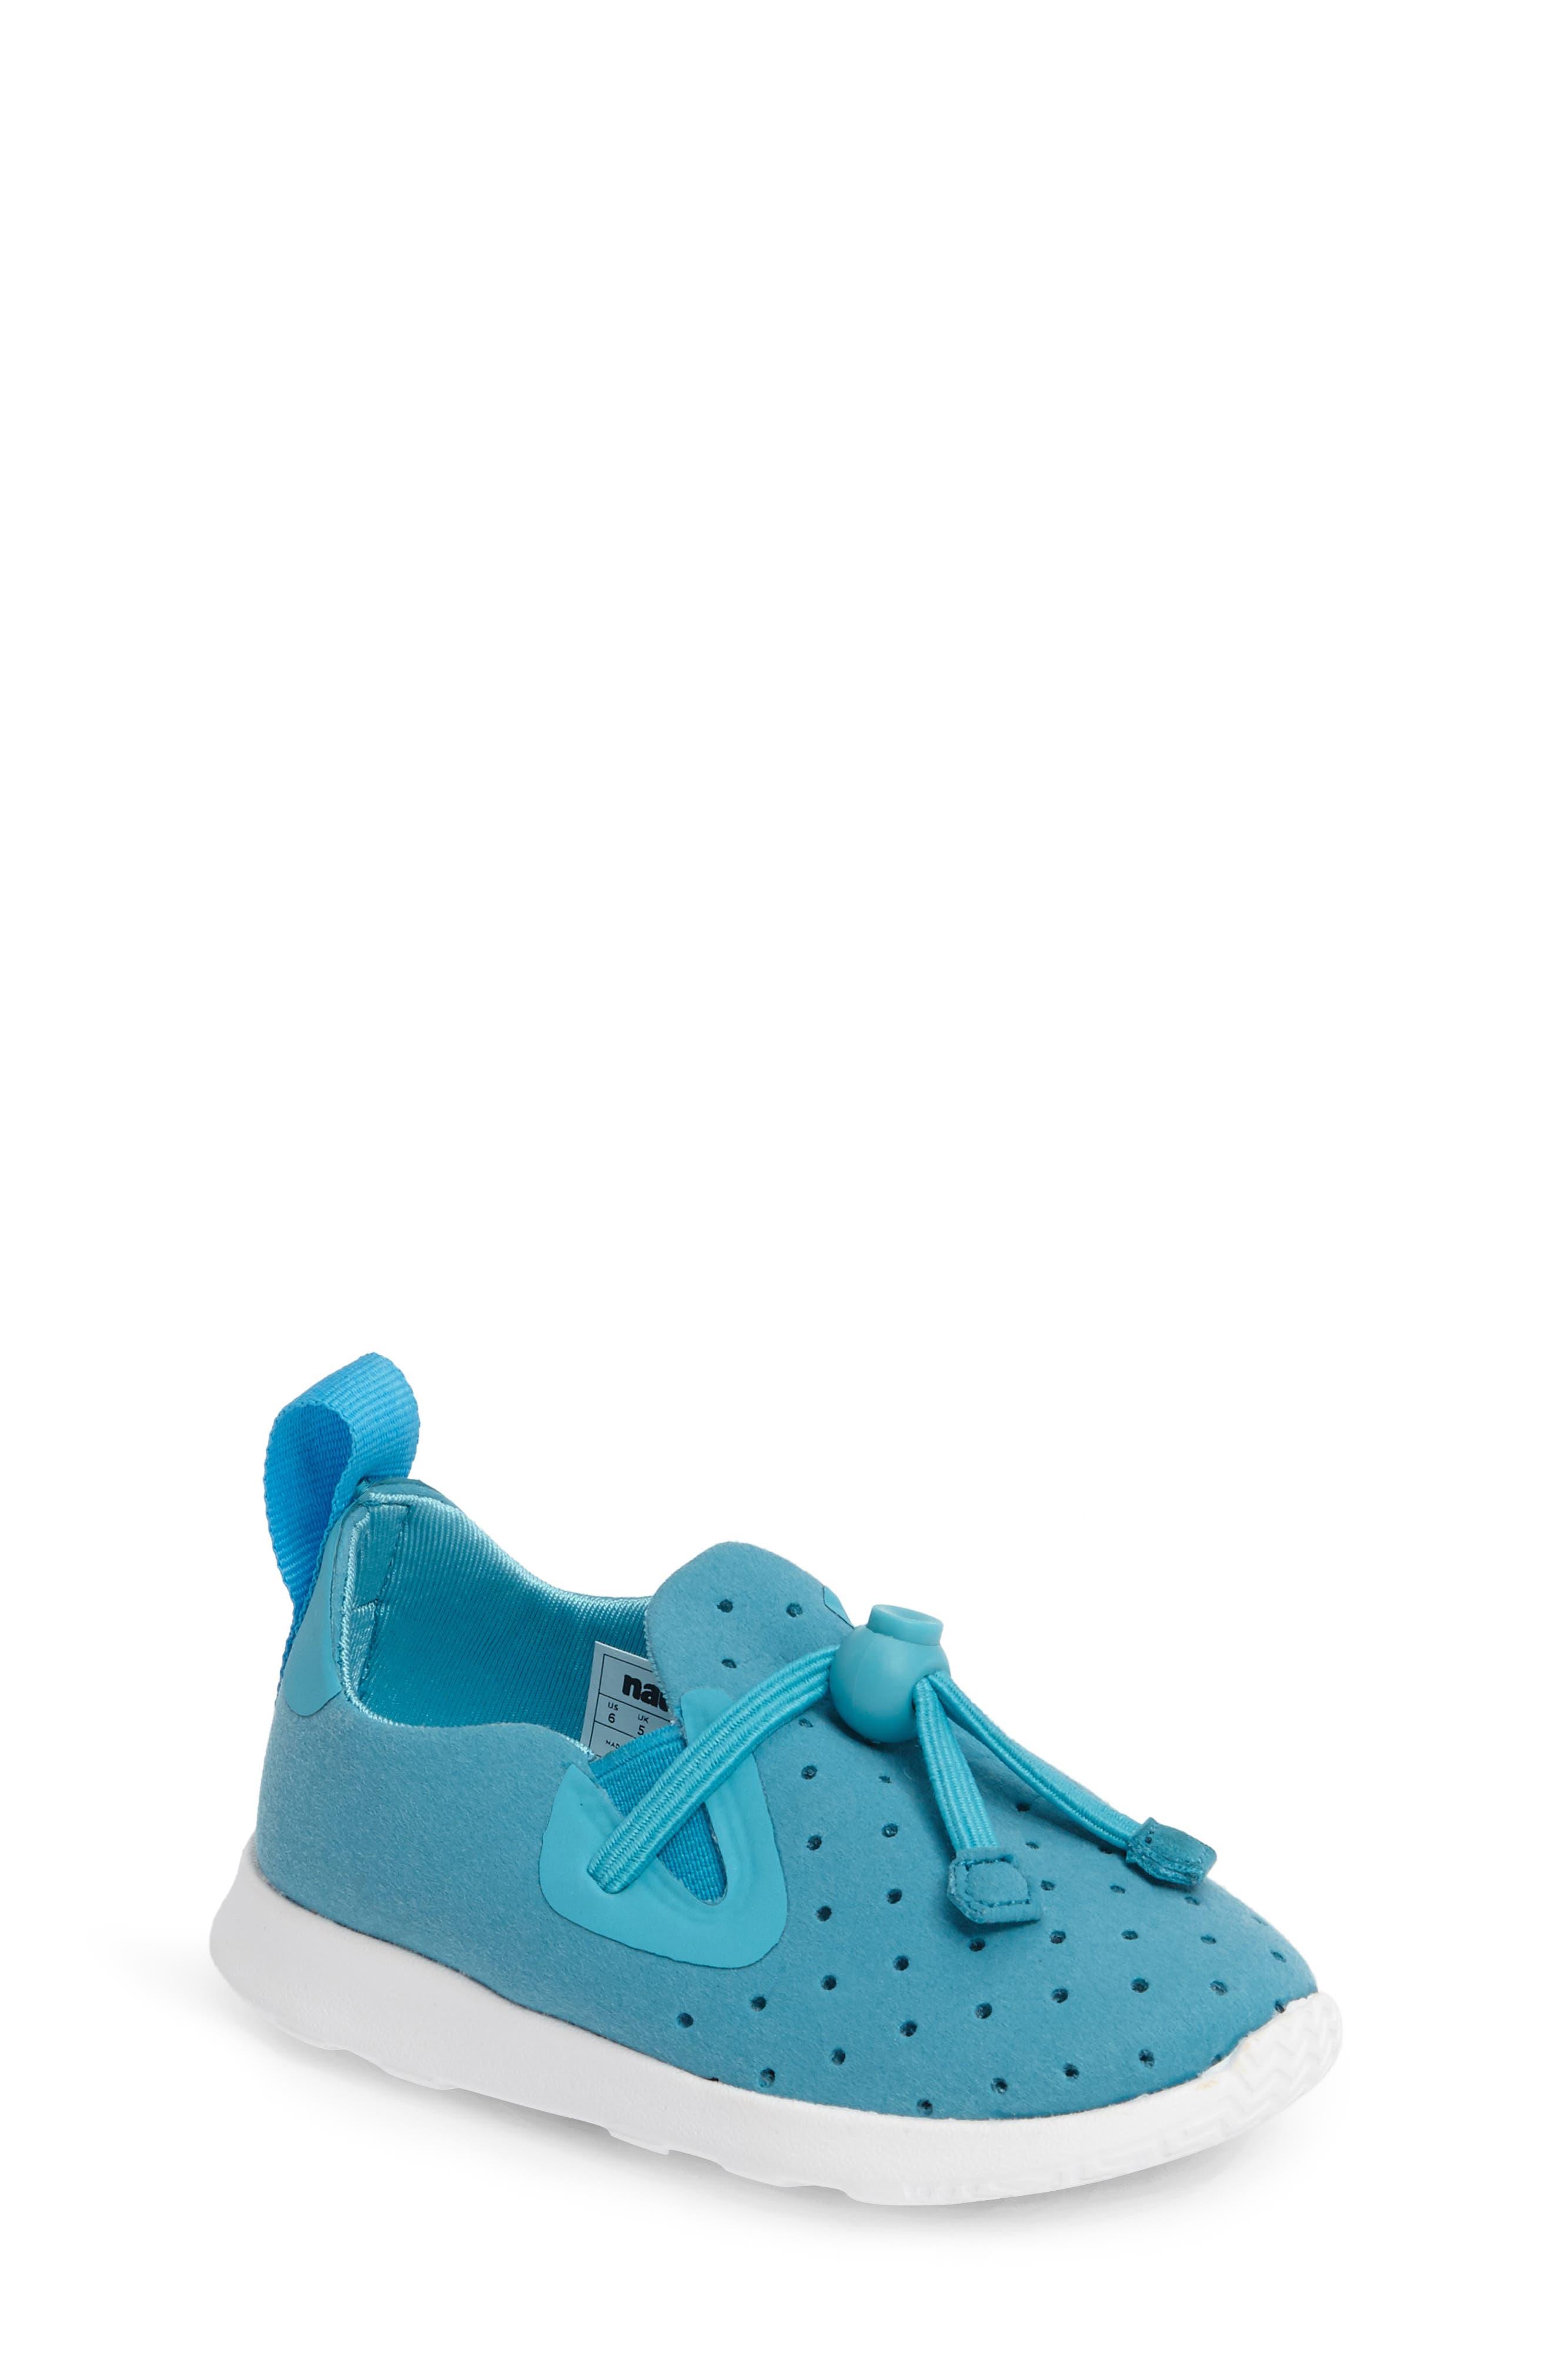 Native Shoes 'Apollo' Sneaker (Walker, Toddler & Little Kid)